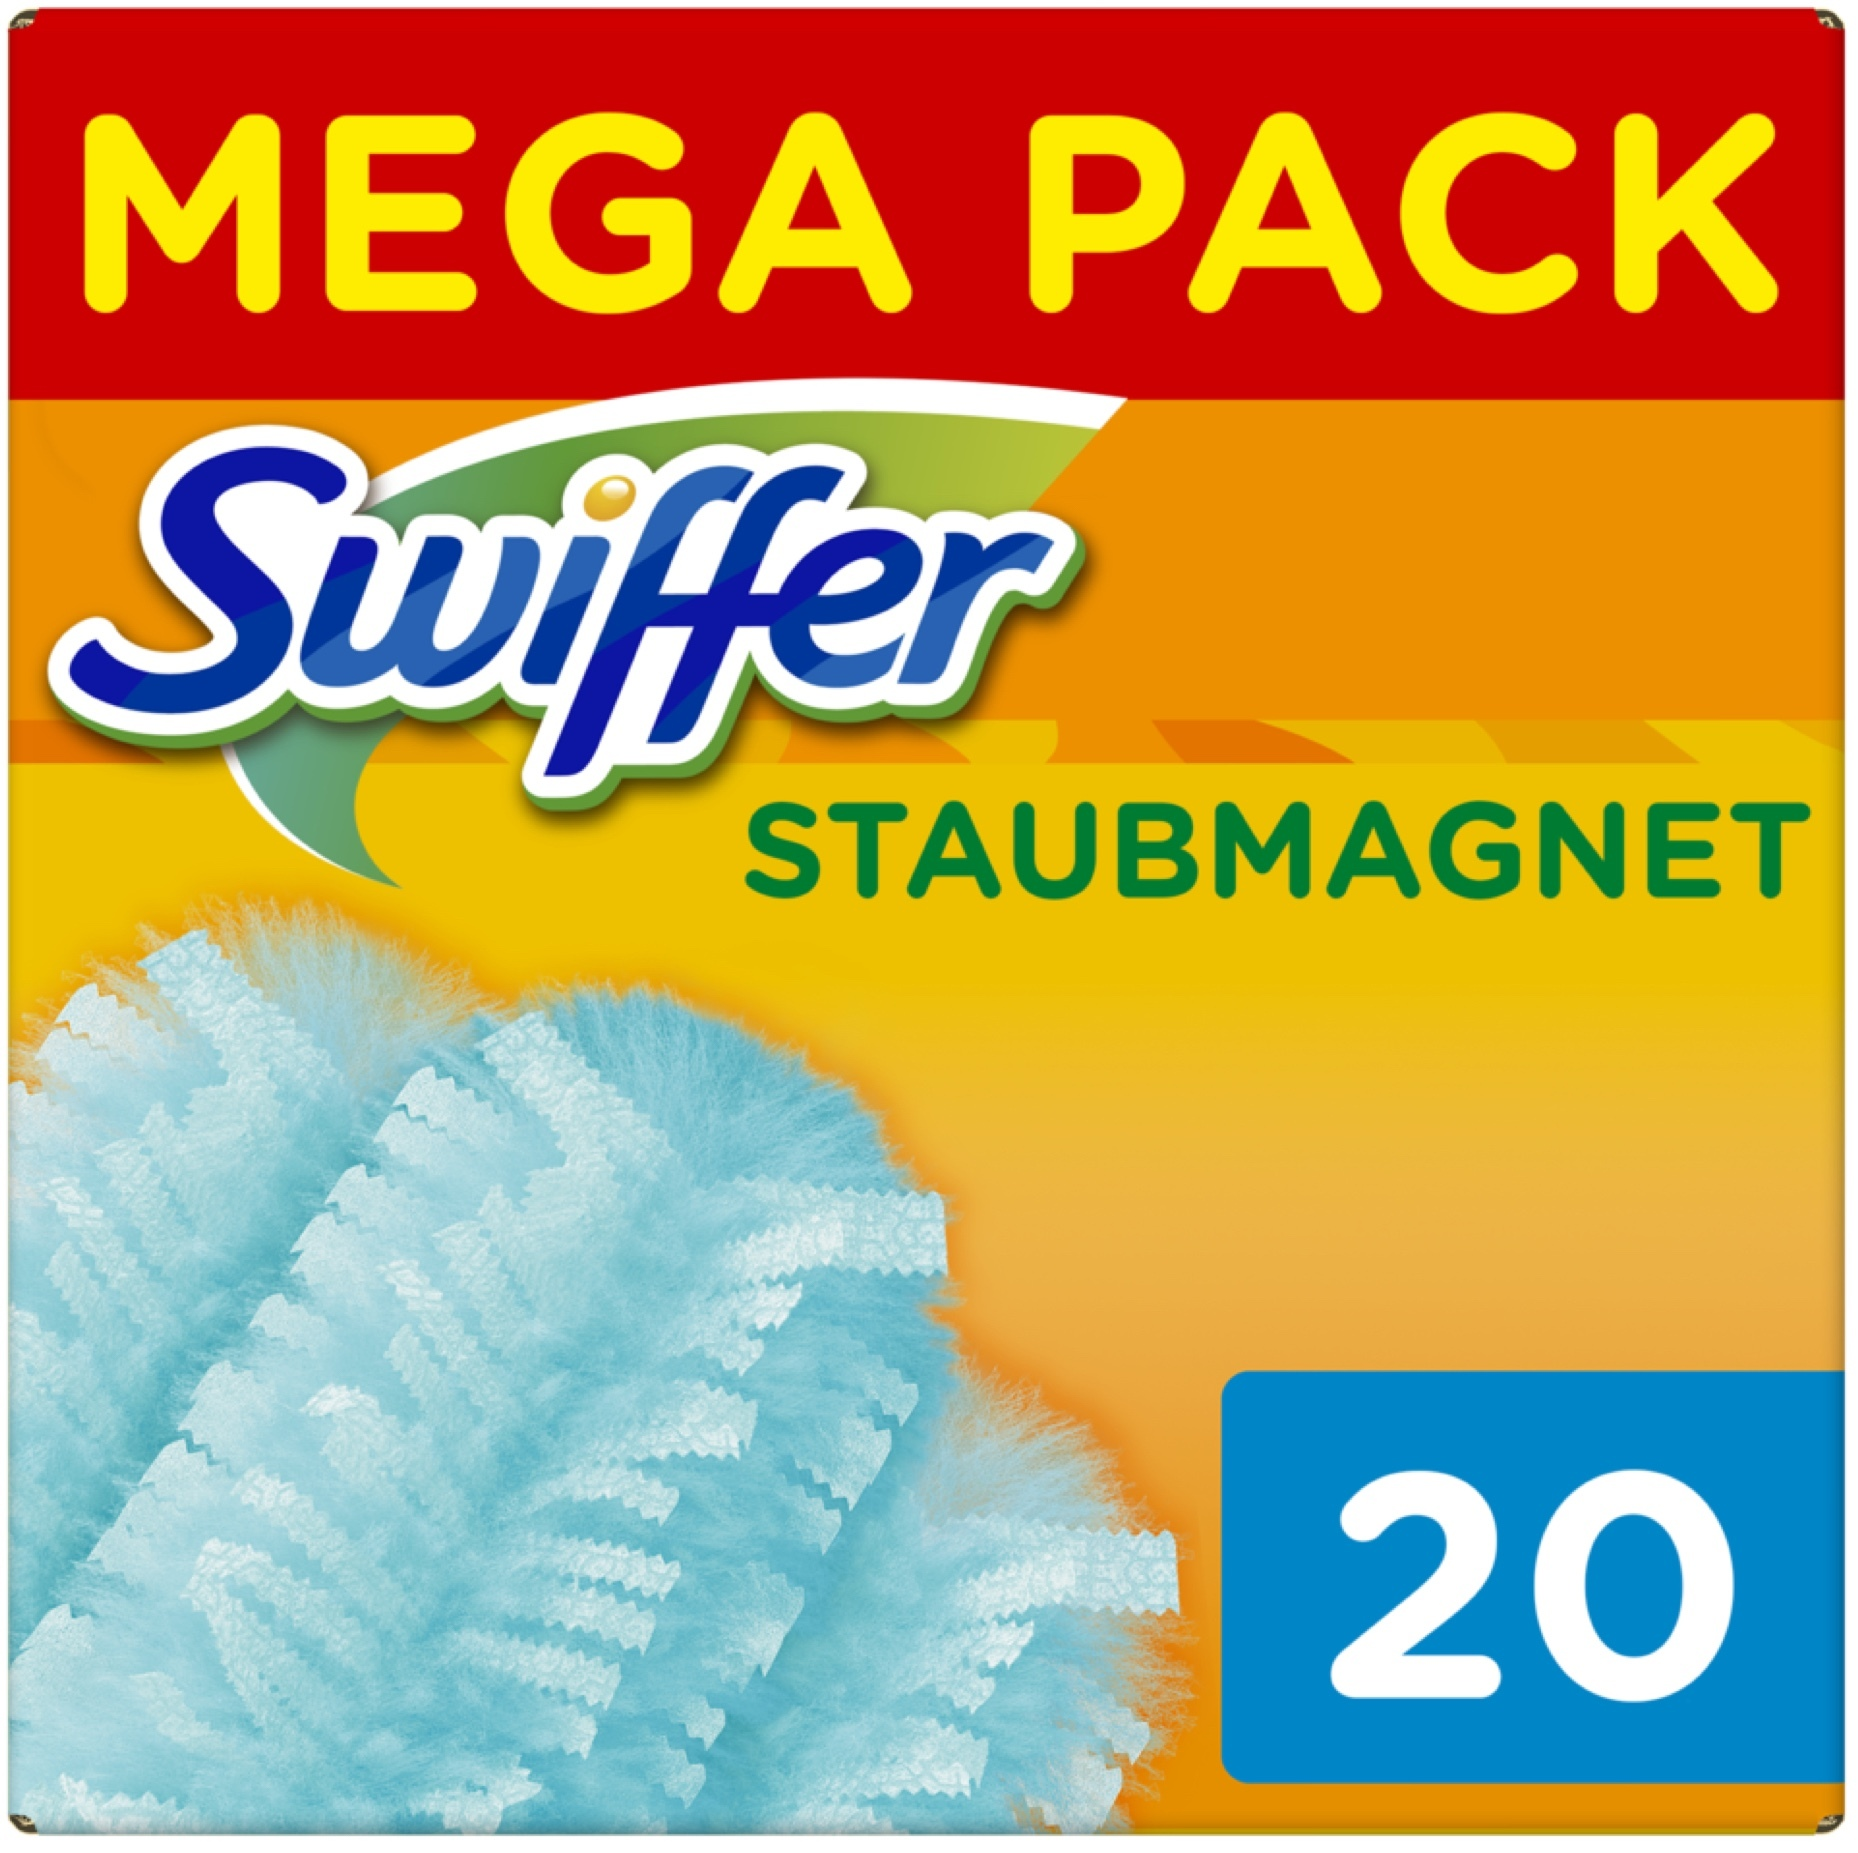 Swiffer Staubmagnet Tücher Staubtücher Staubmagnet Megapack